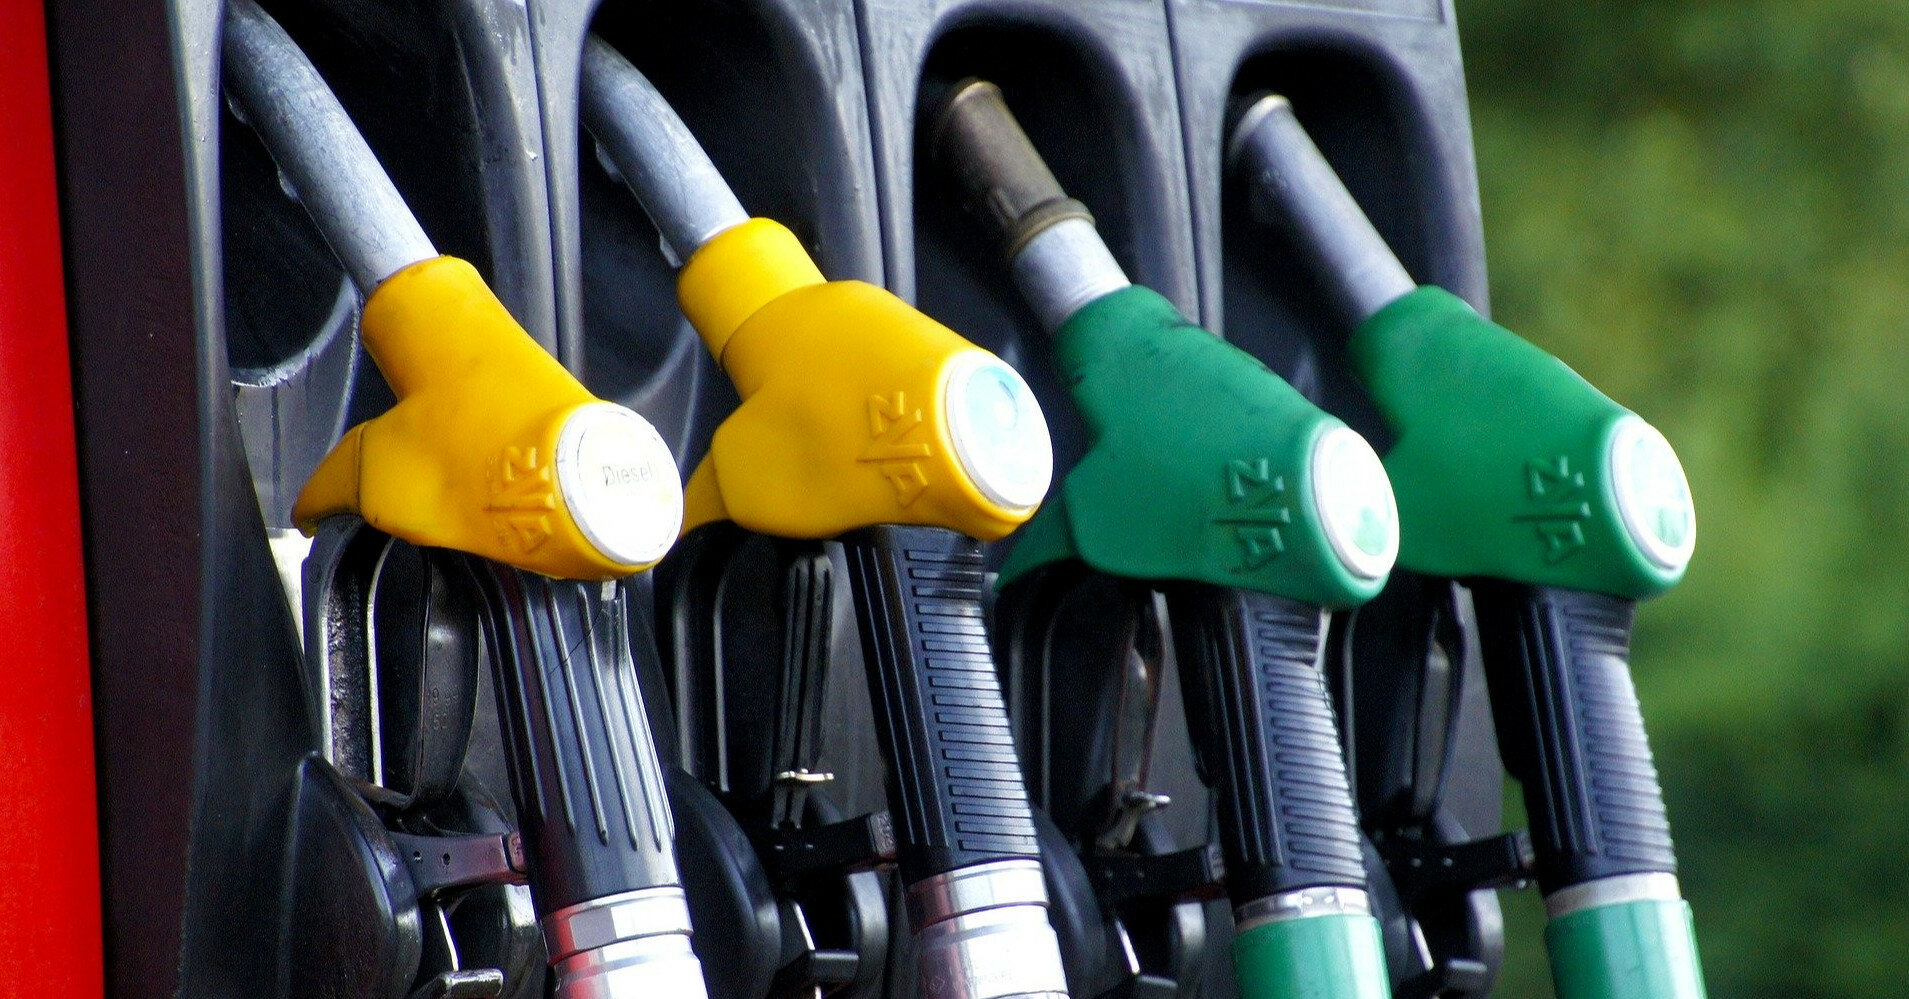 Рада приняла за основу законопроект о биотопливе в автобензине